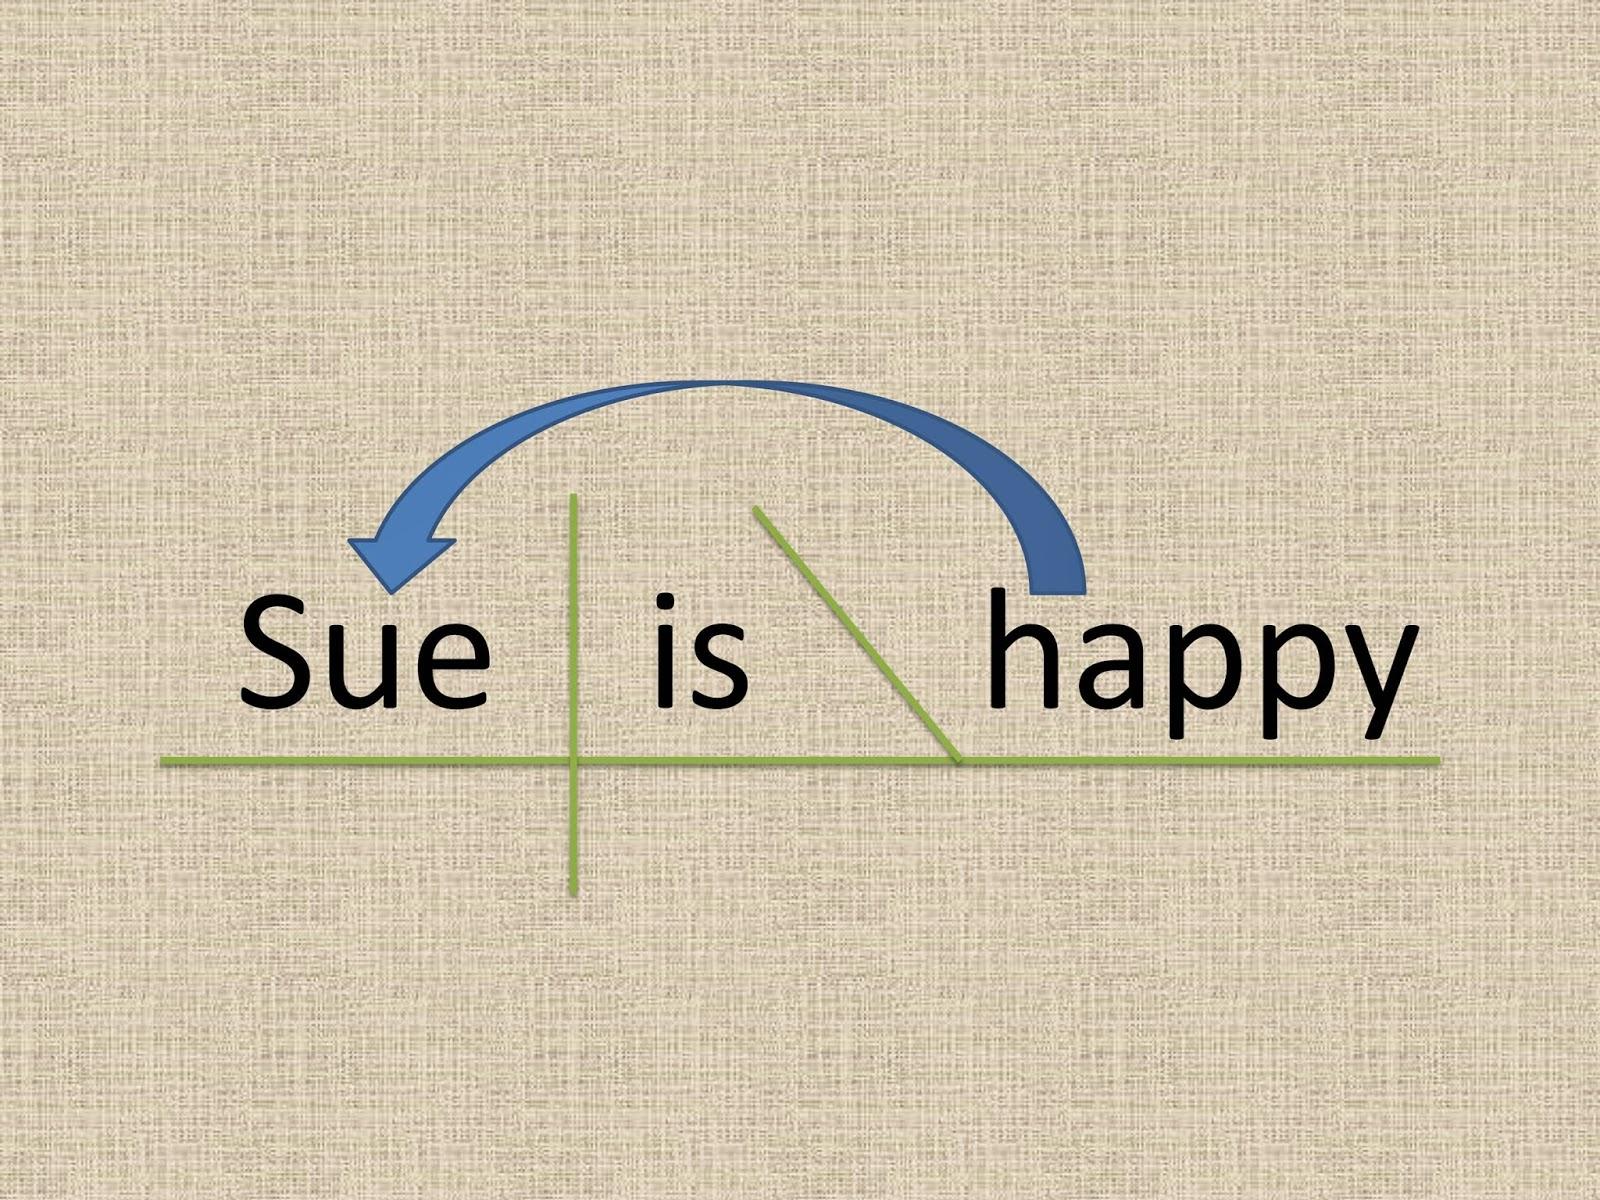 Gypsy Daughter Essays Sentence Diagramming Diagramming